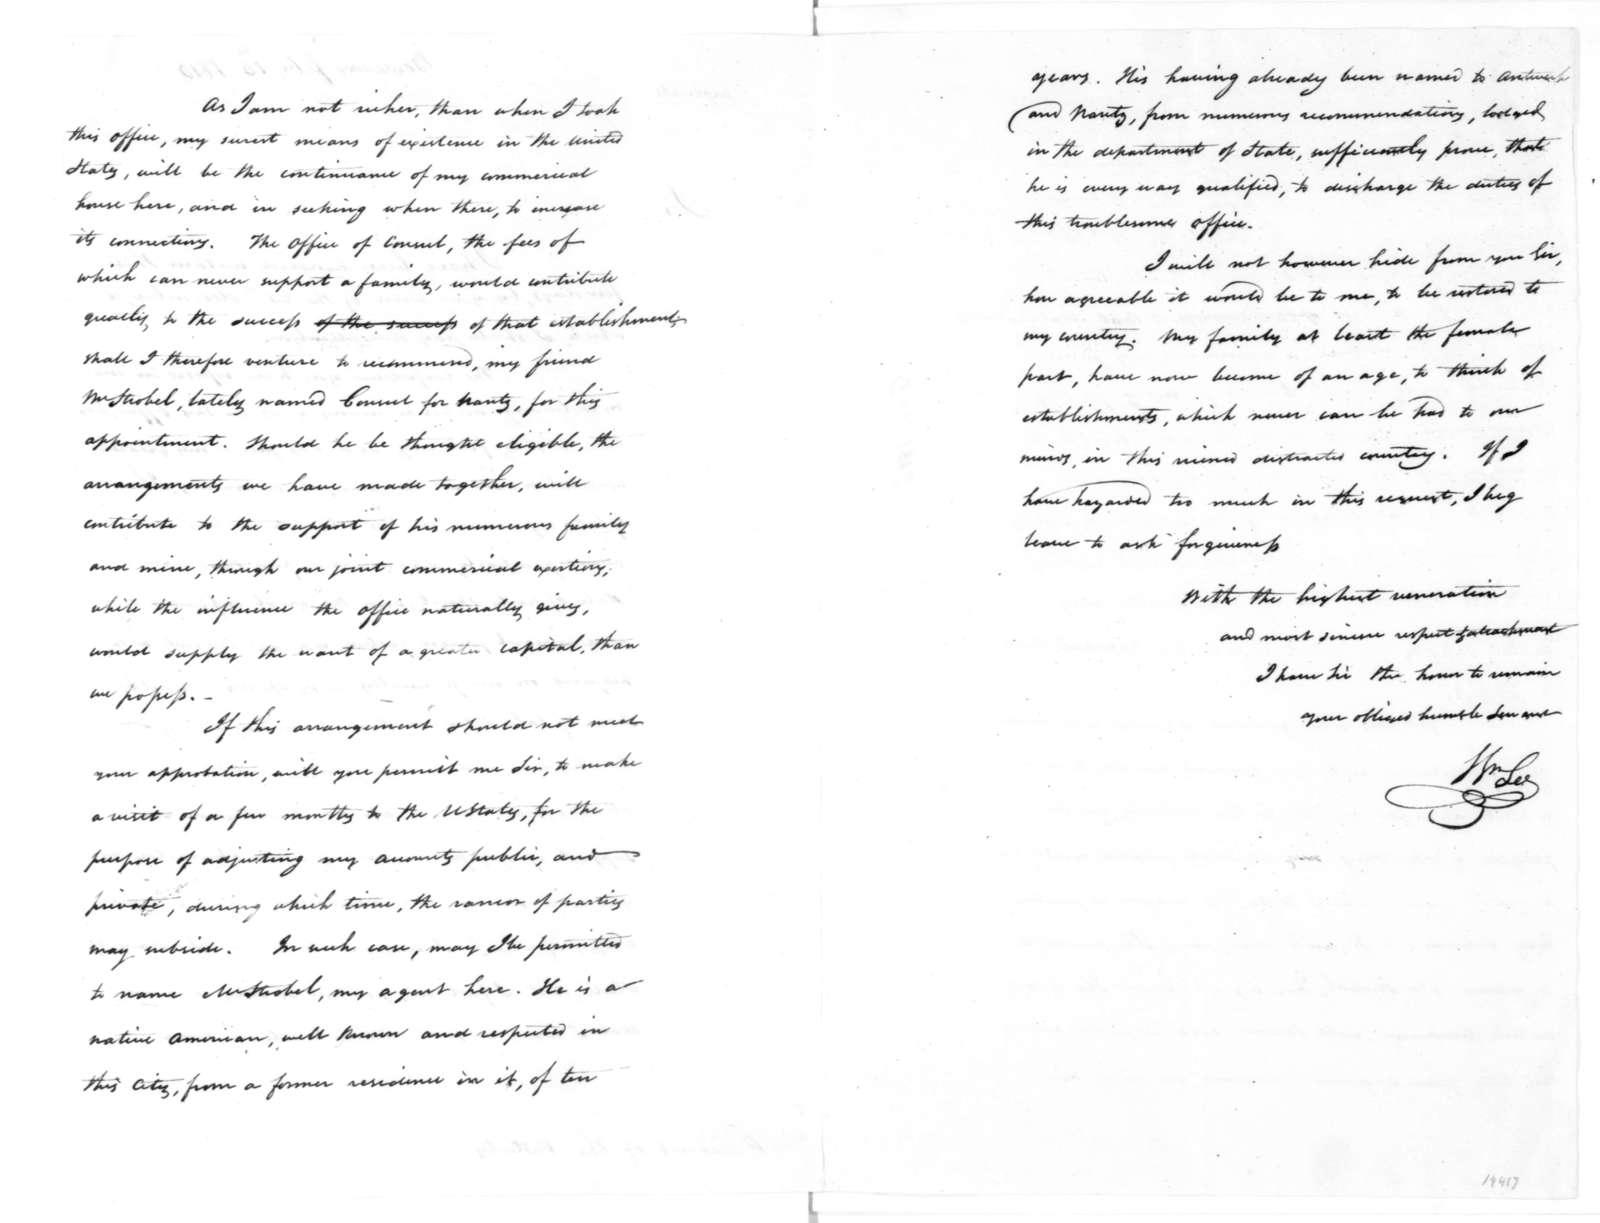 William Lee to James Madison, February 16, 1816.